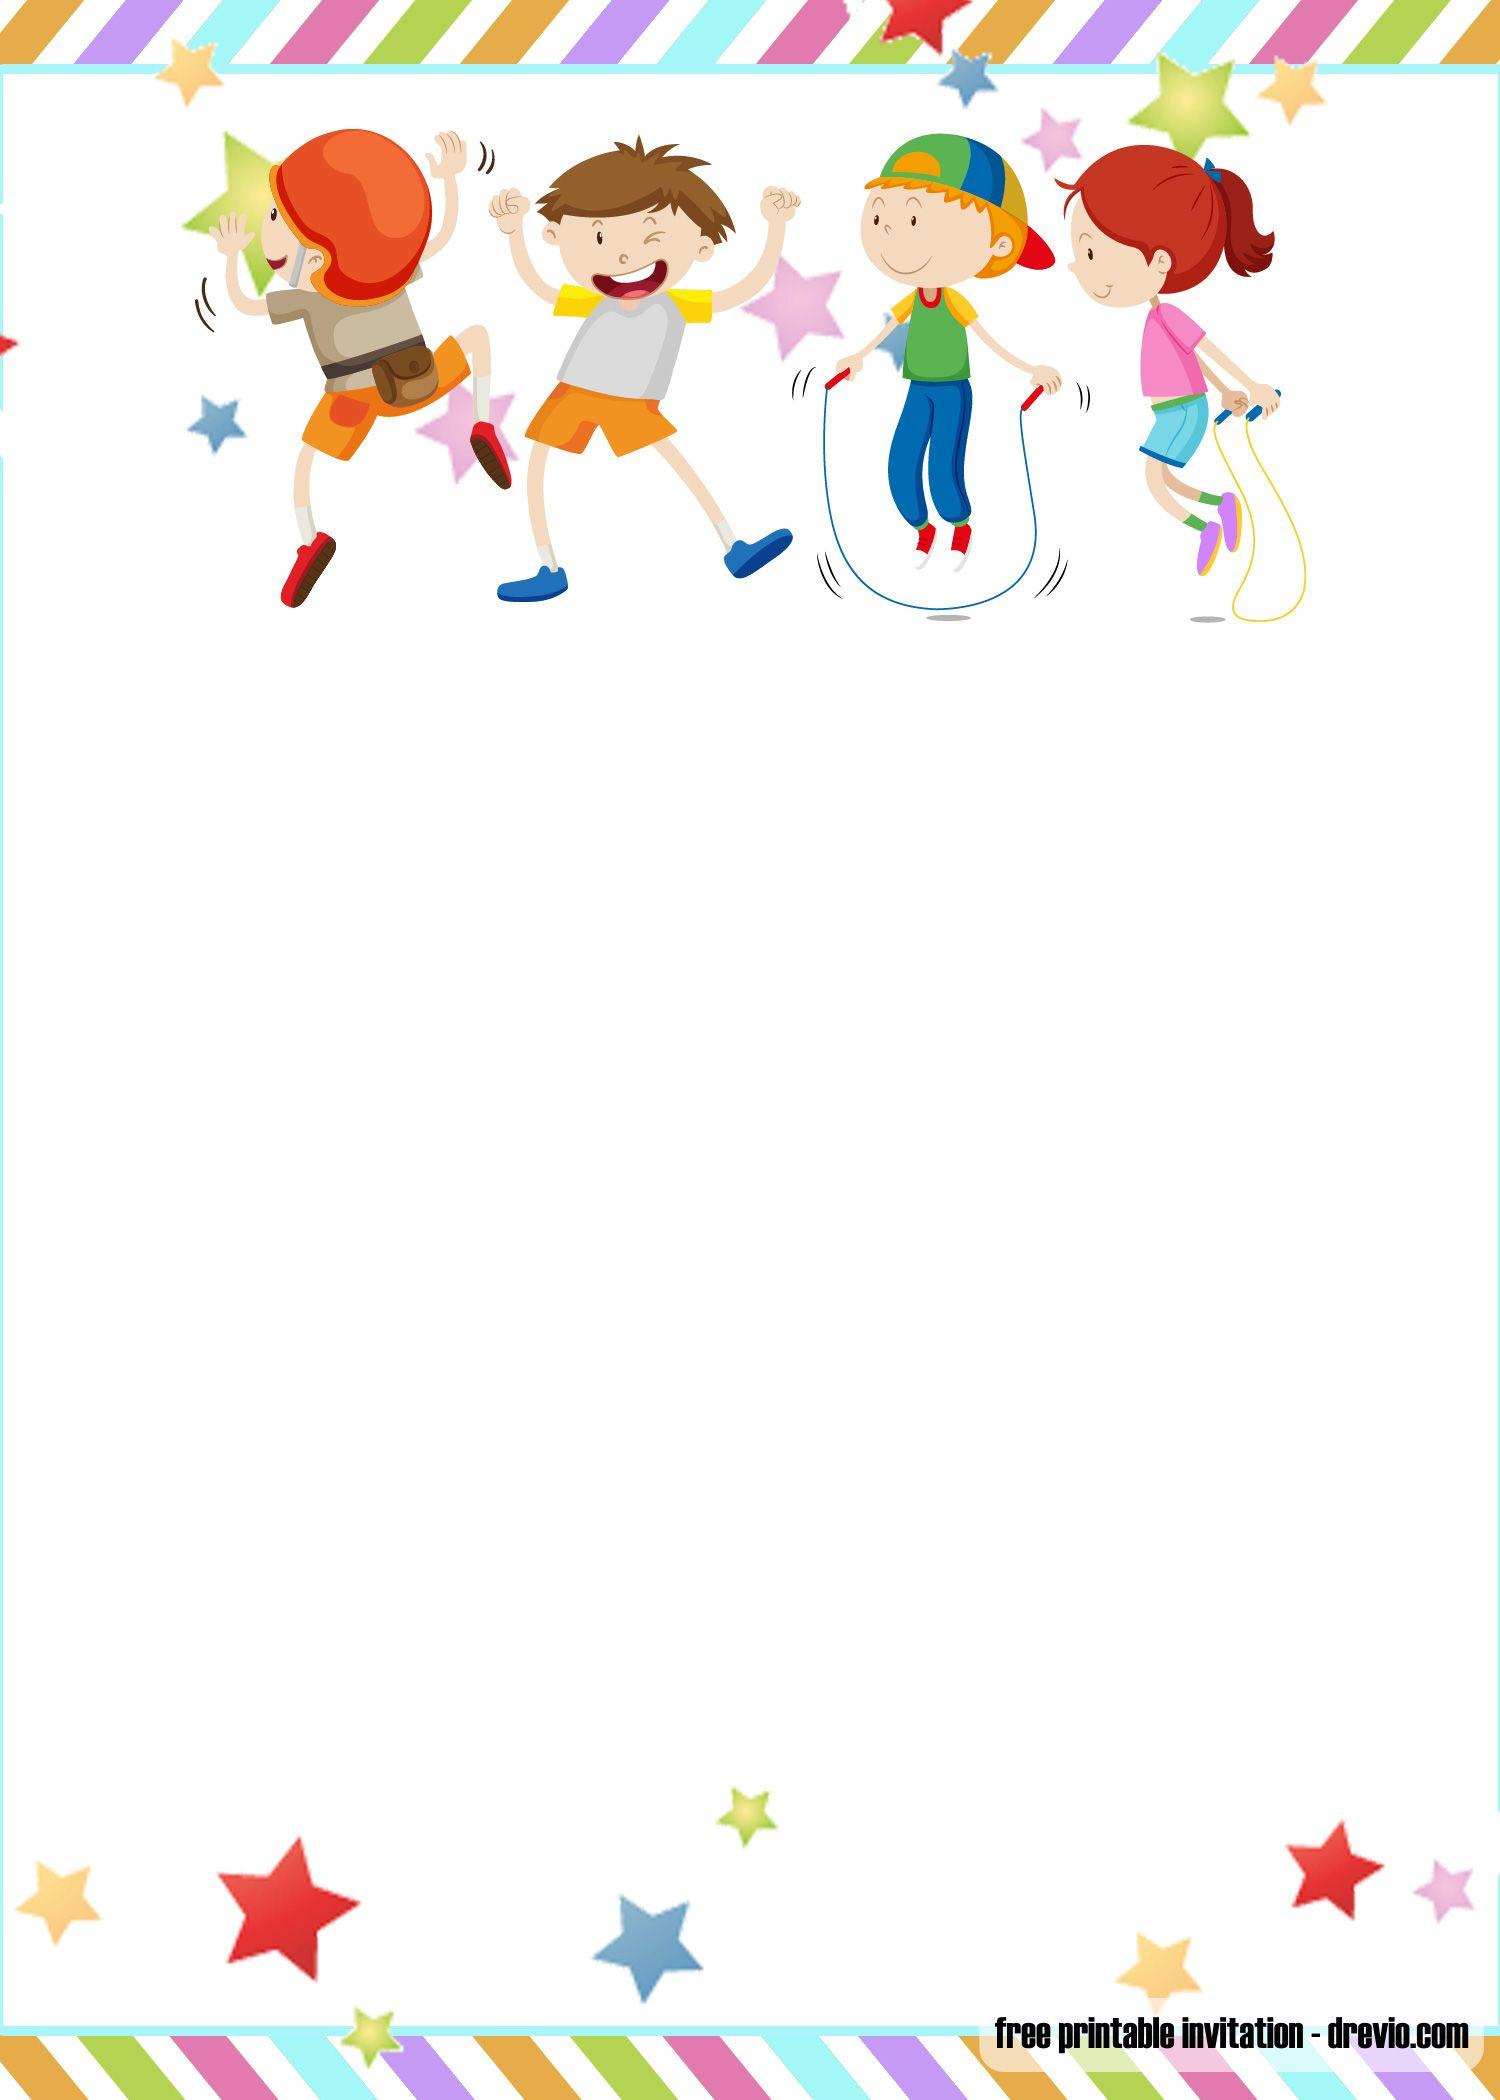 FREE Printable Trampoline Jump Birthday Invitation Templates